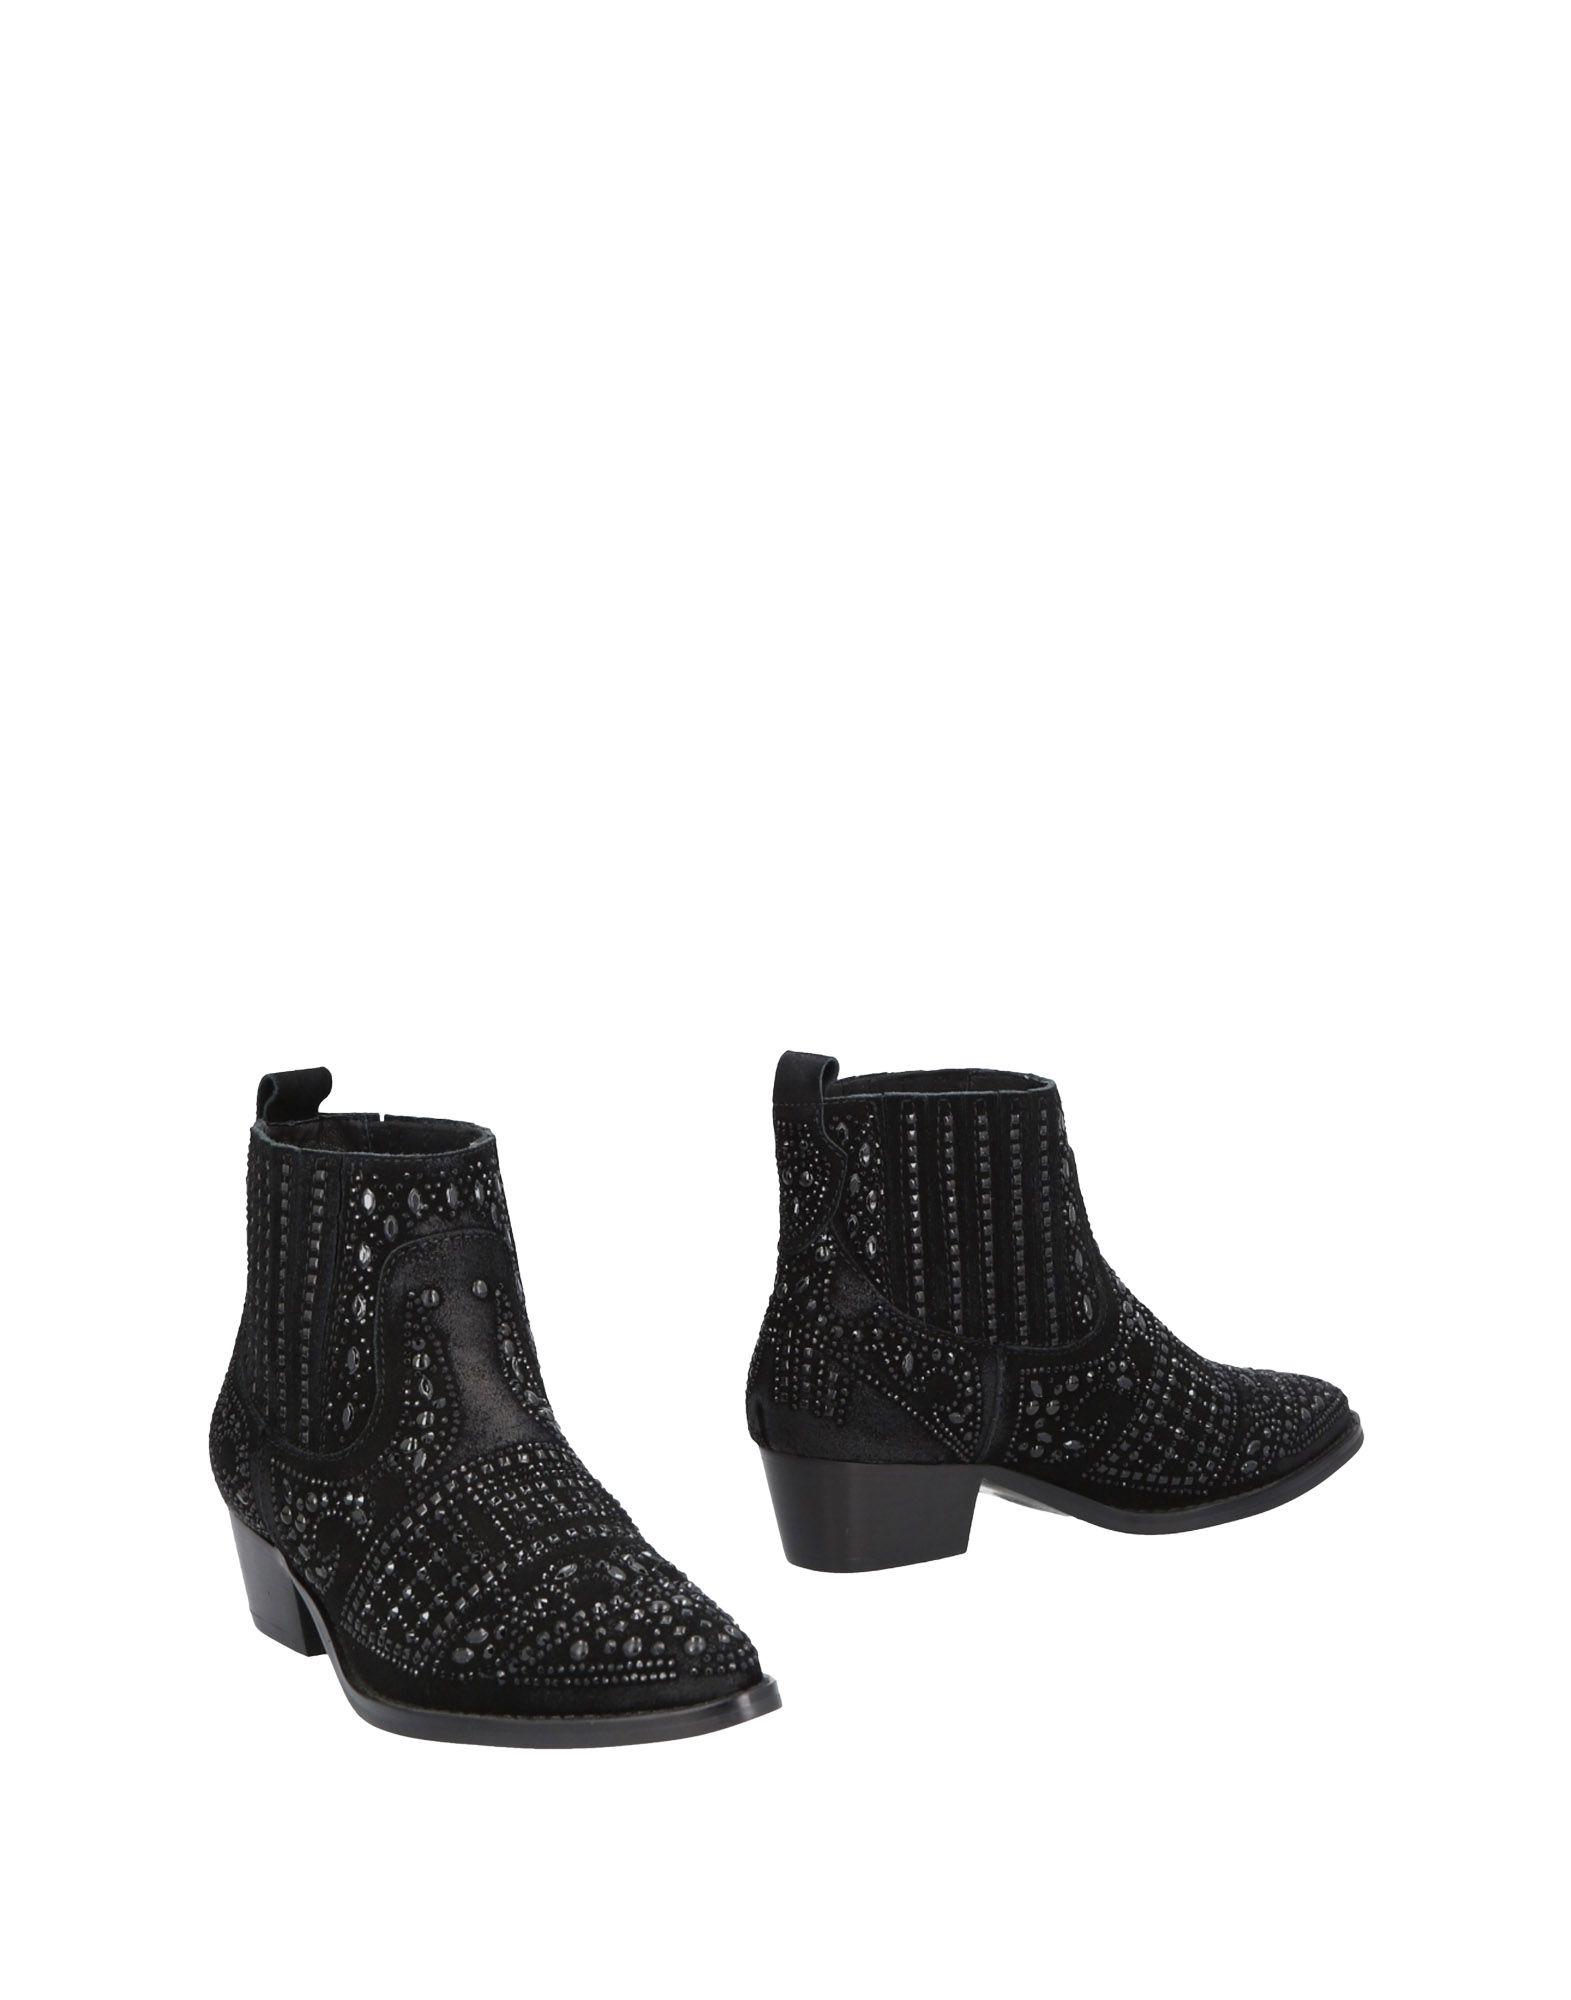 Bibi Lou Stiefelette Damen  11472225EM Gute Qualität beliebte Schuhe